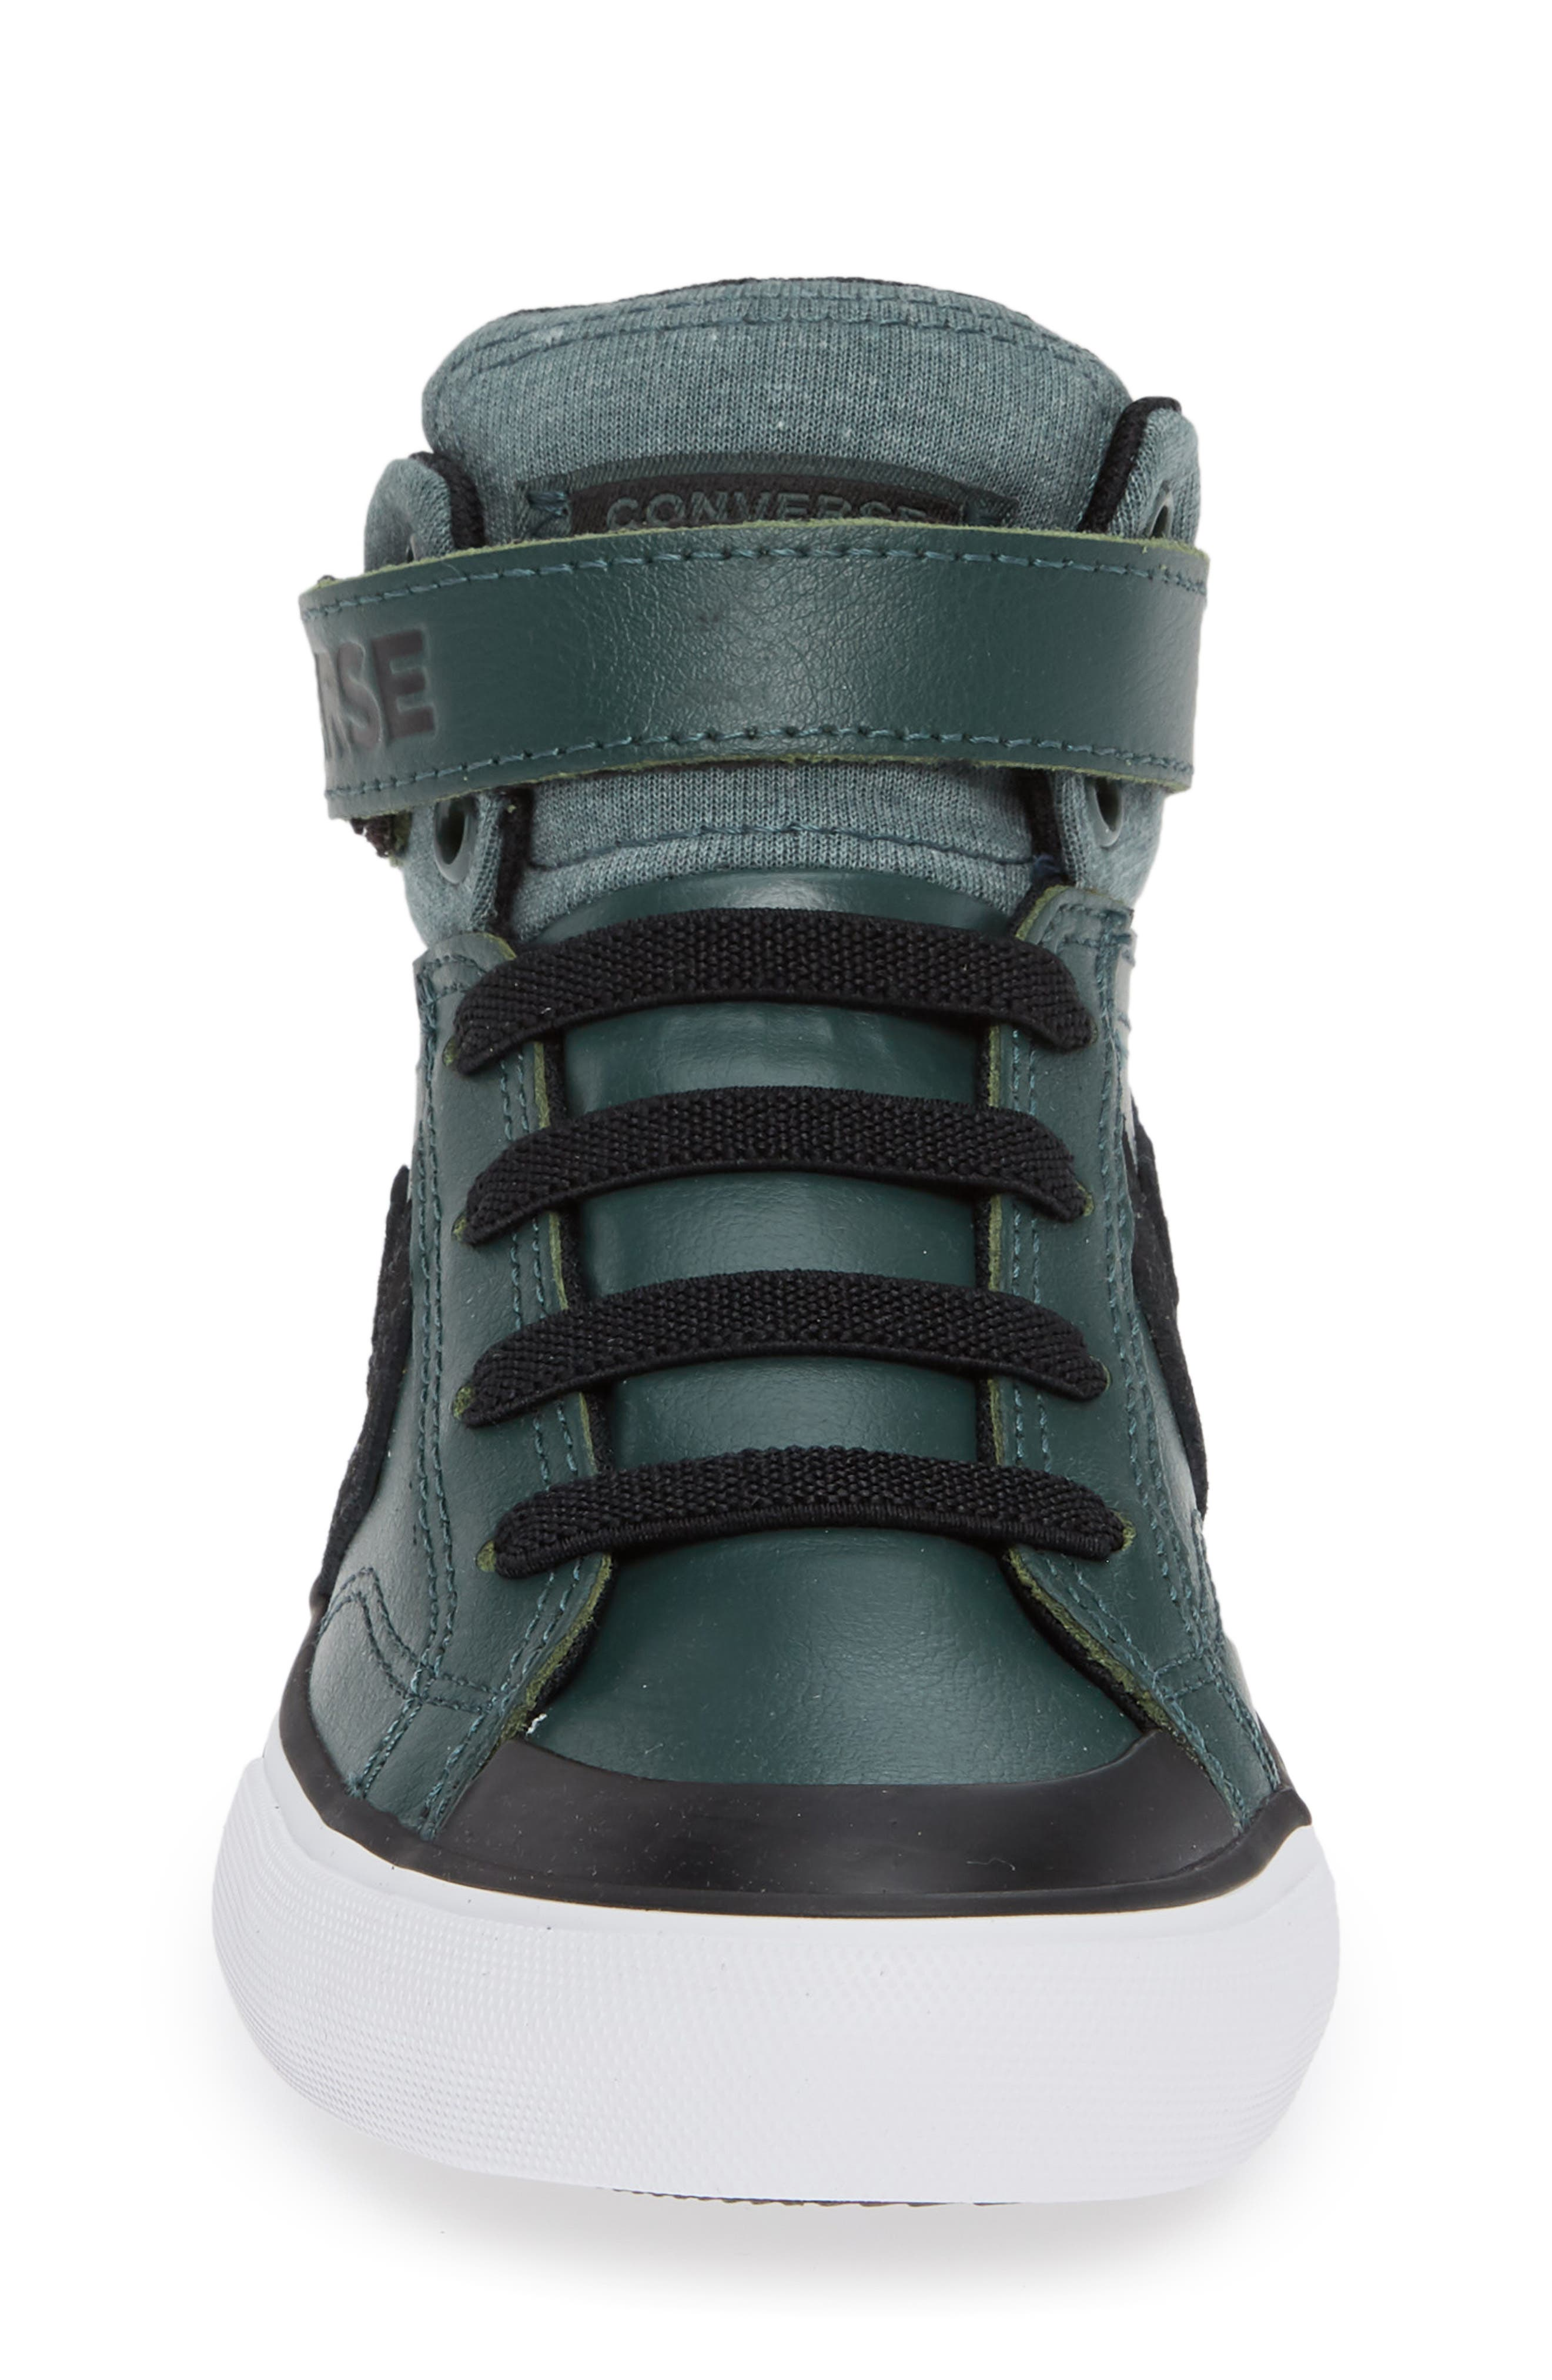 Pro Blaze High Top Sneaker,                             Alternate thumbnail 4, color,                             VINTAGE GREEN